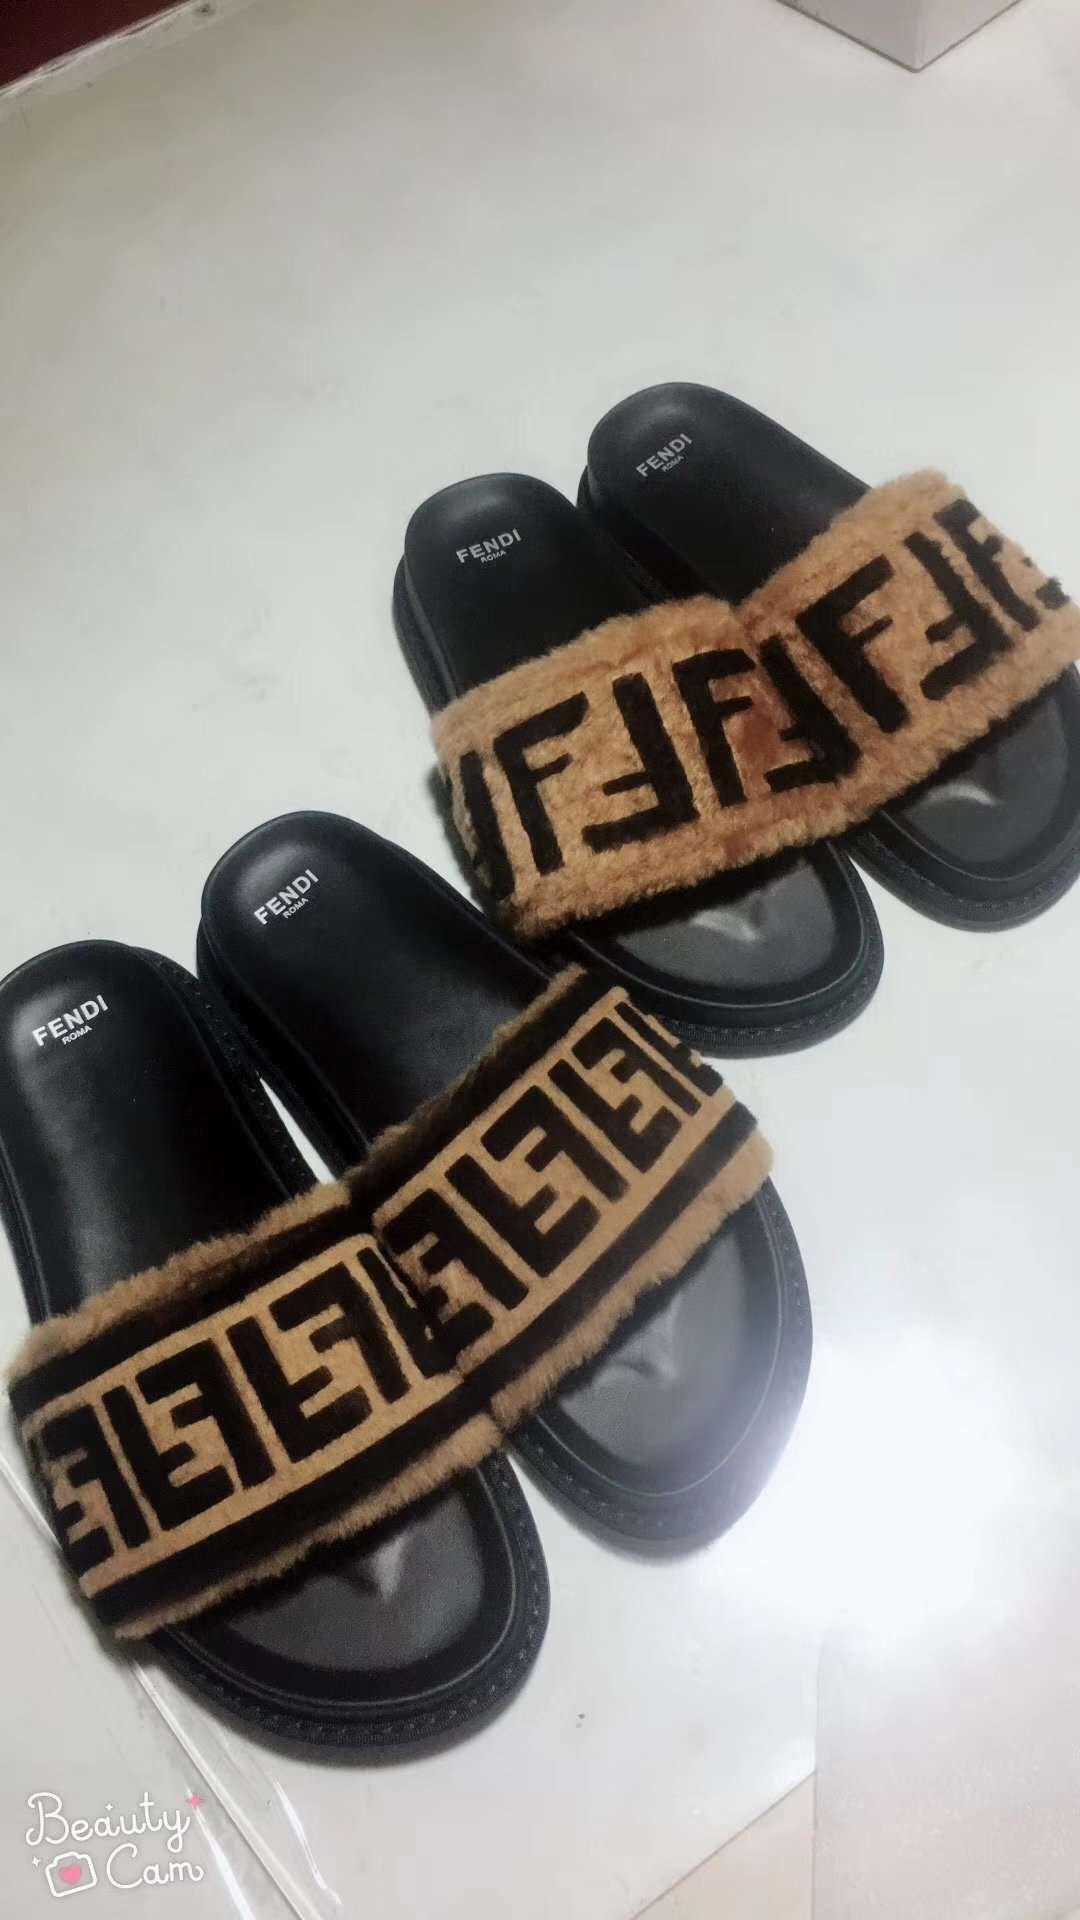 58b61c3460e 2019 Women Sandals Designer Slides Brand Fashion Striped Sandals Medusa  Scuffs Causal Non Slip Summer Huaraches Slippers Flip Flops Slipper Nude  Wedges ...